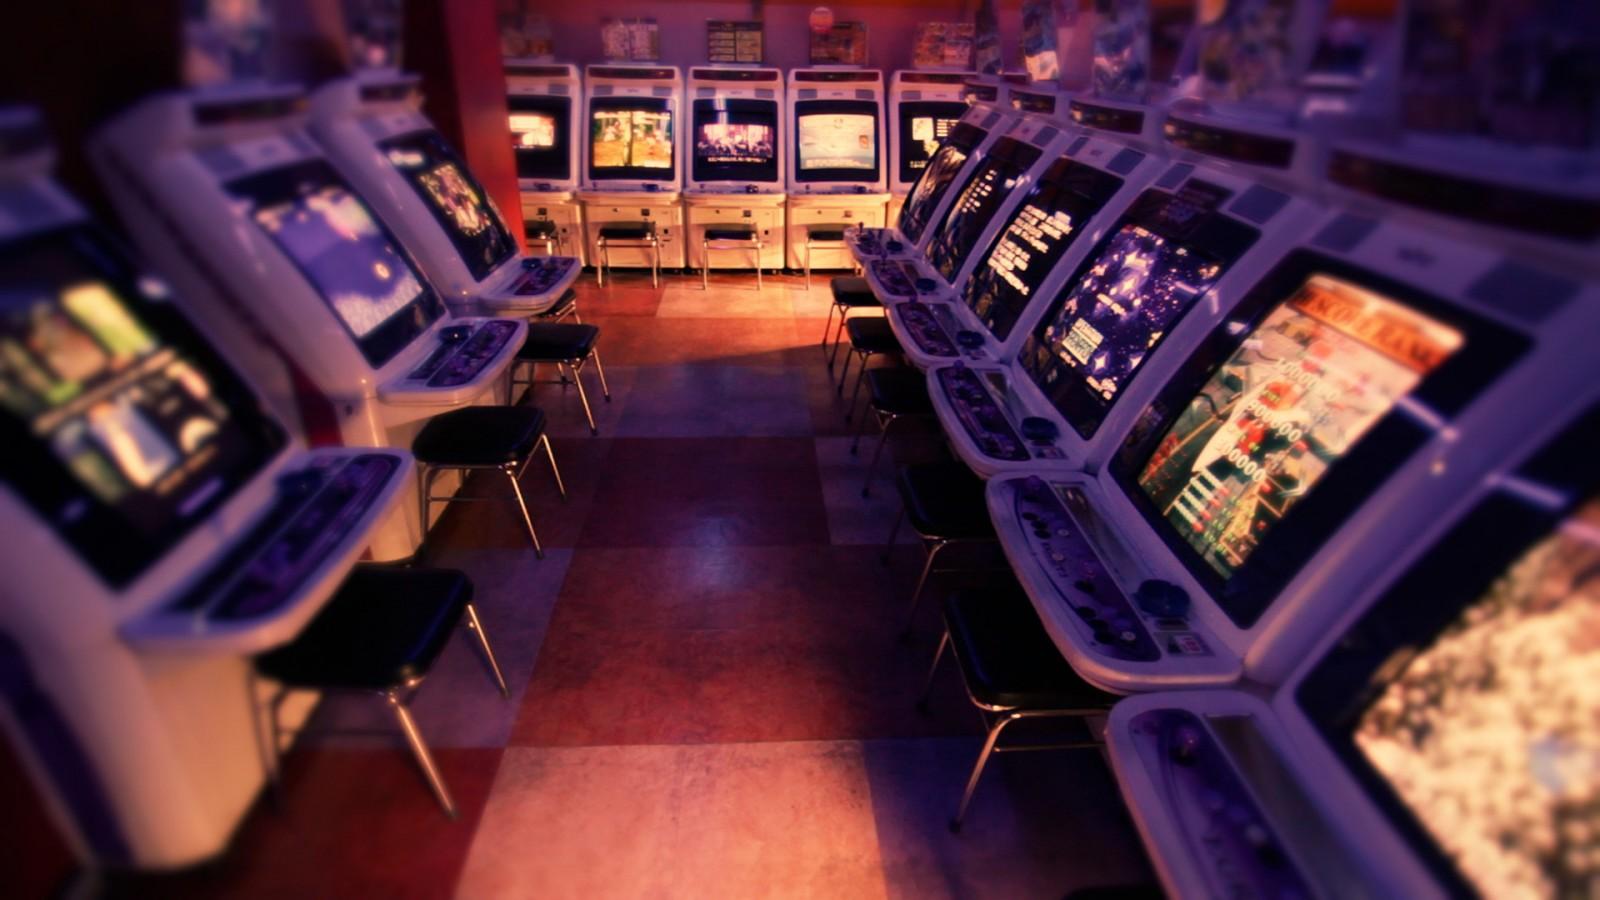 Japon, Arcades, Tokio, Tokyo